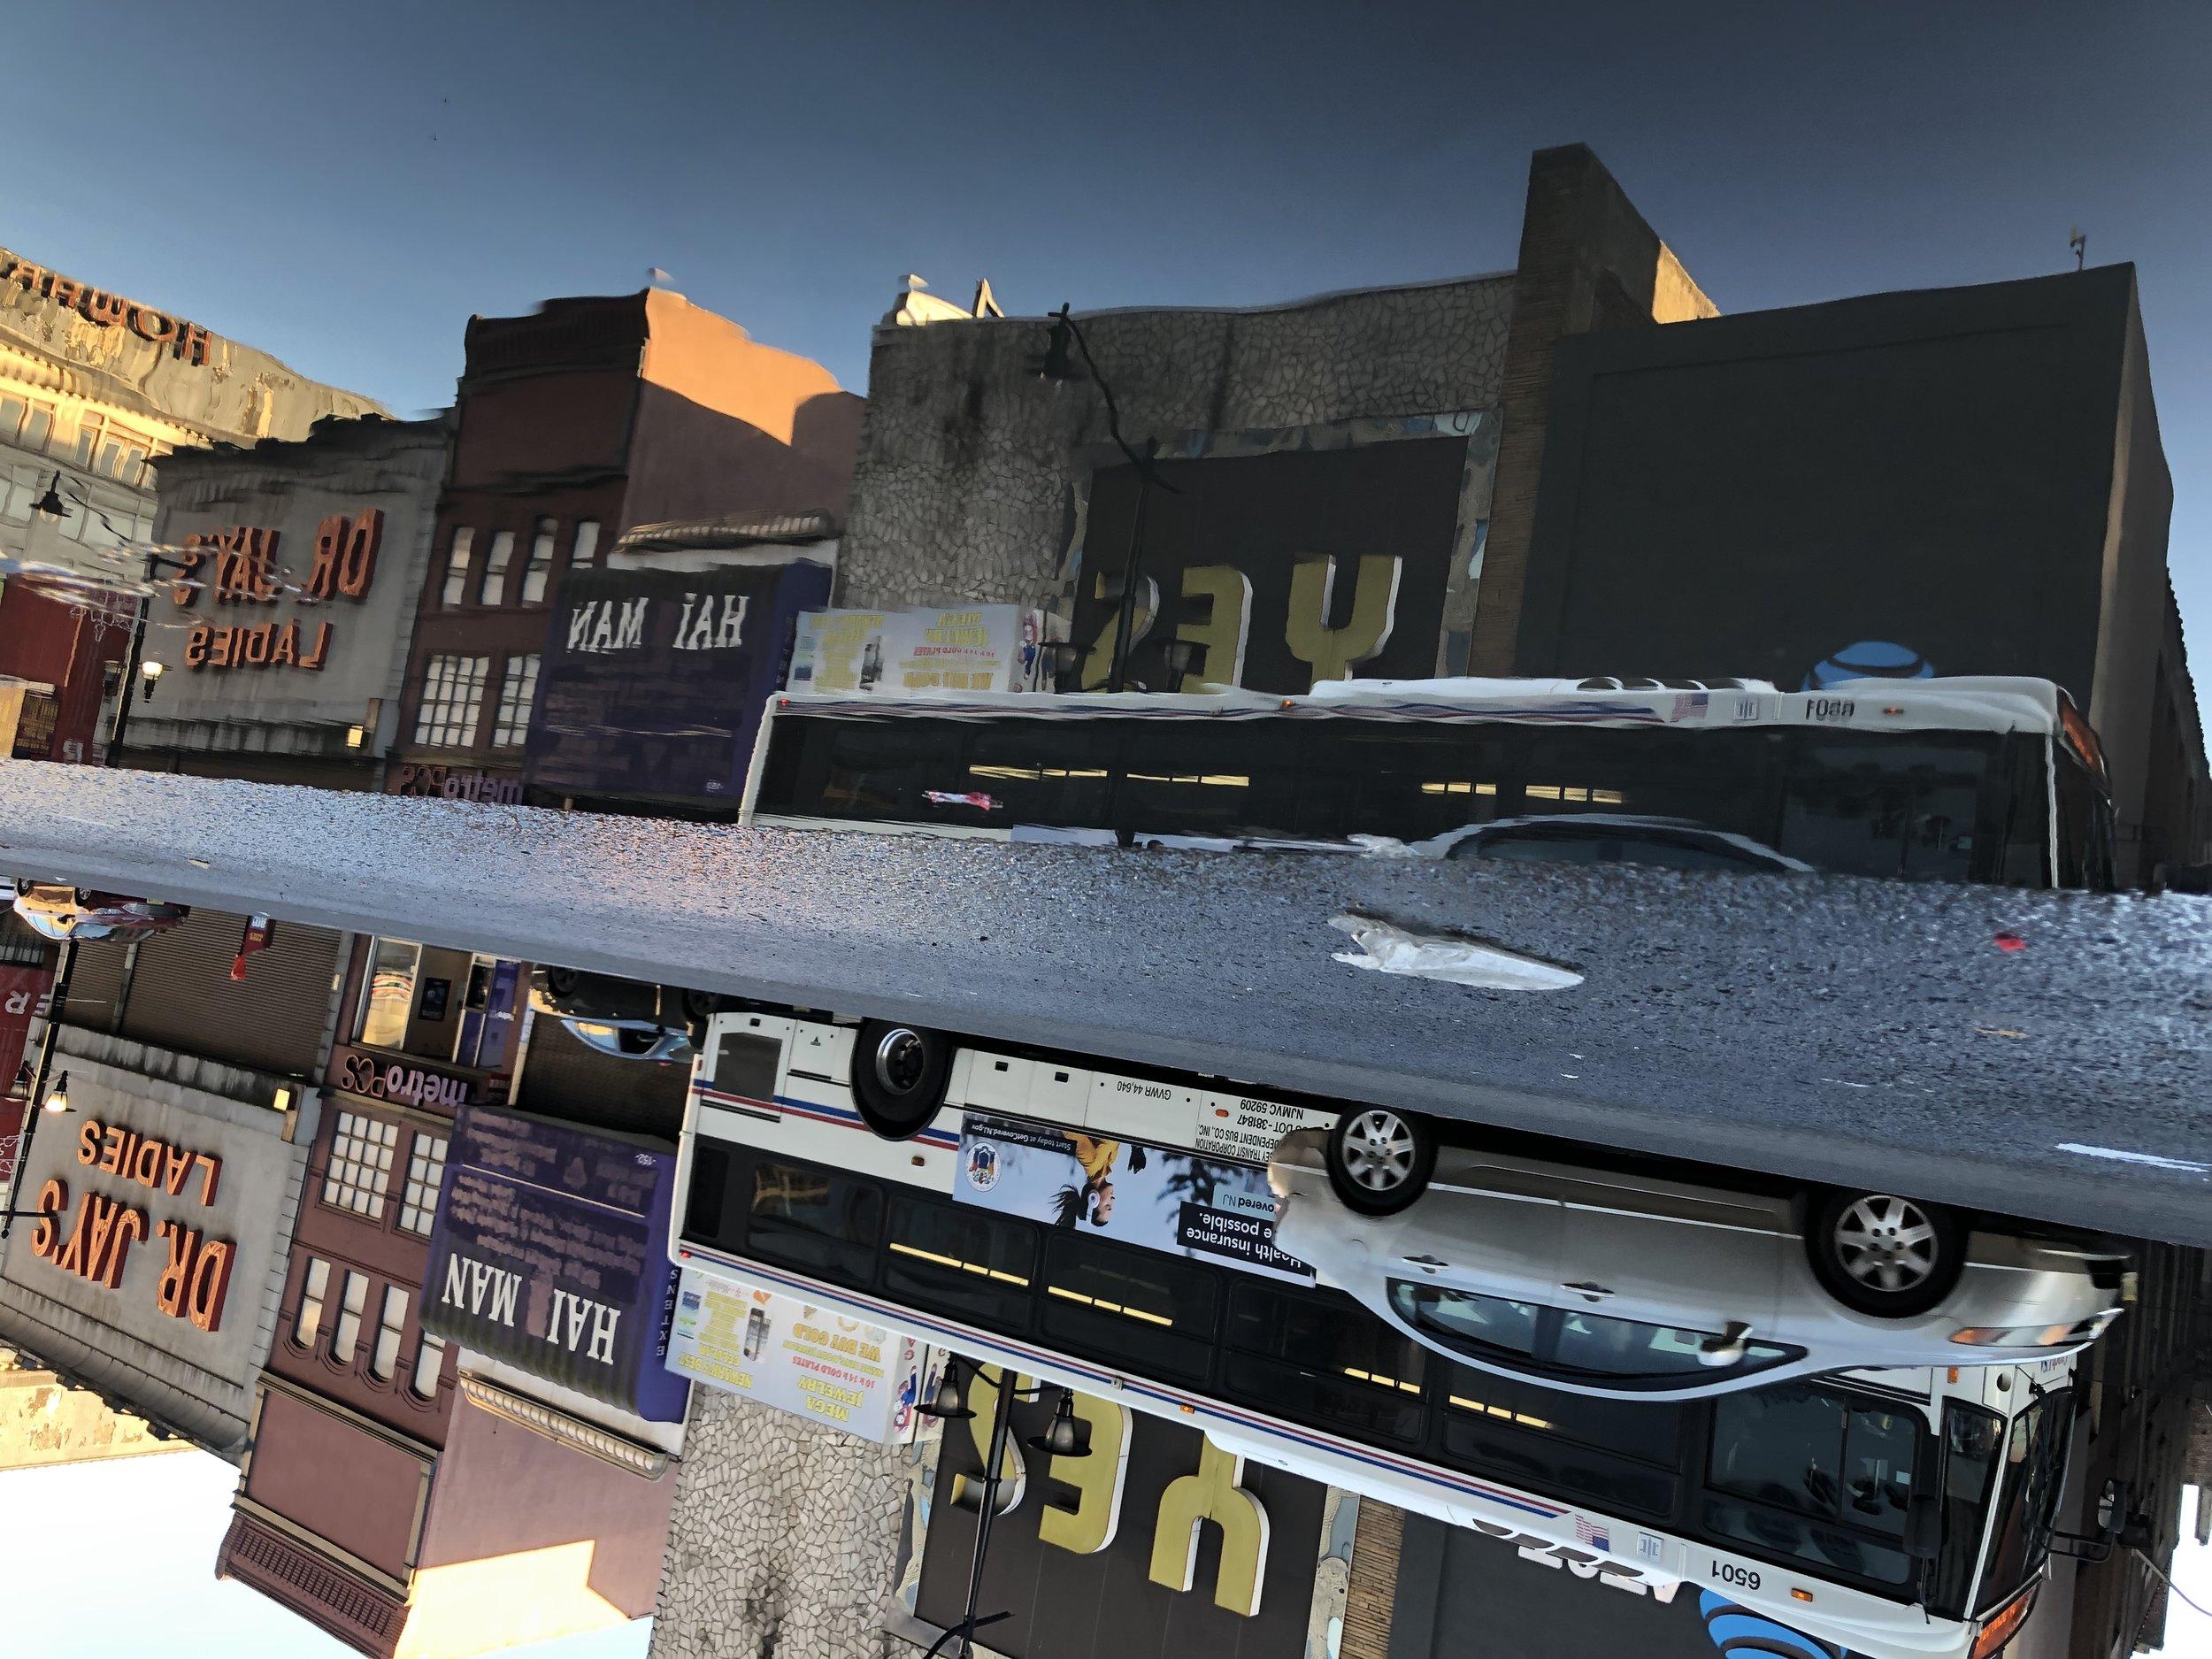 Downtown Newark, 2019